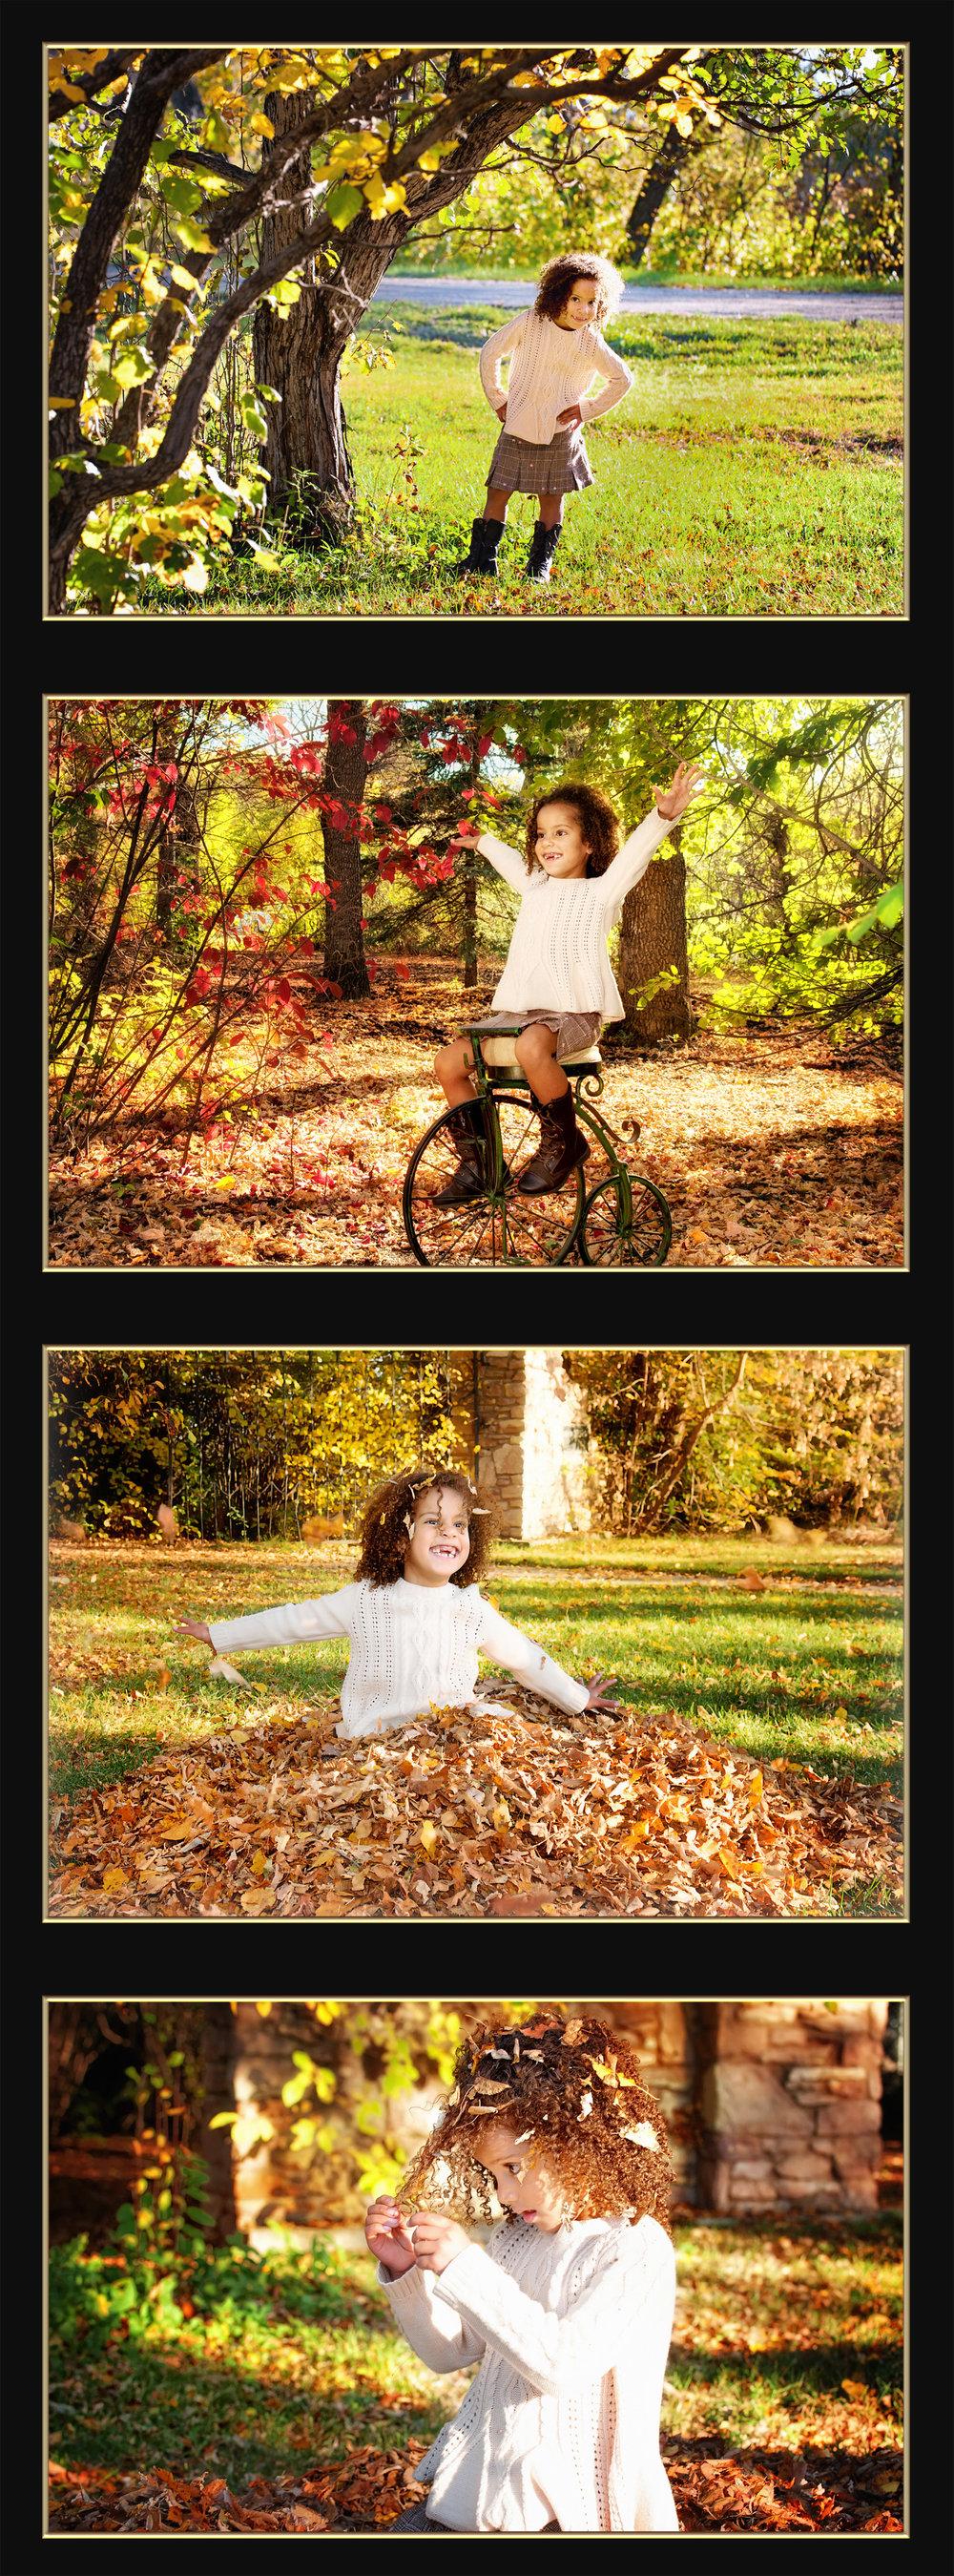 fall-sessions-free-lense-photo-001.jpg